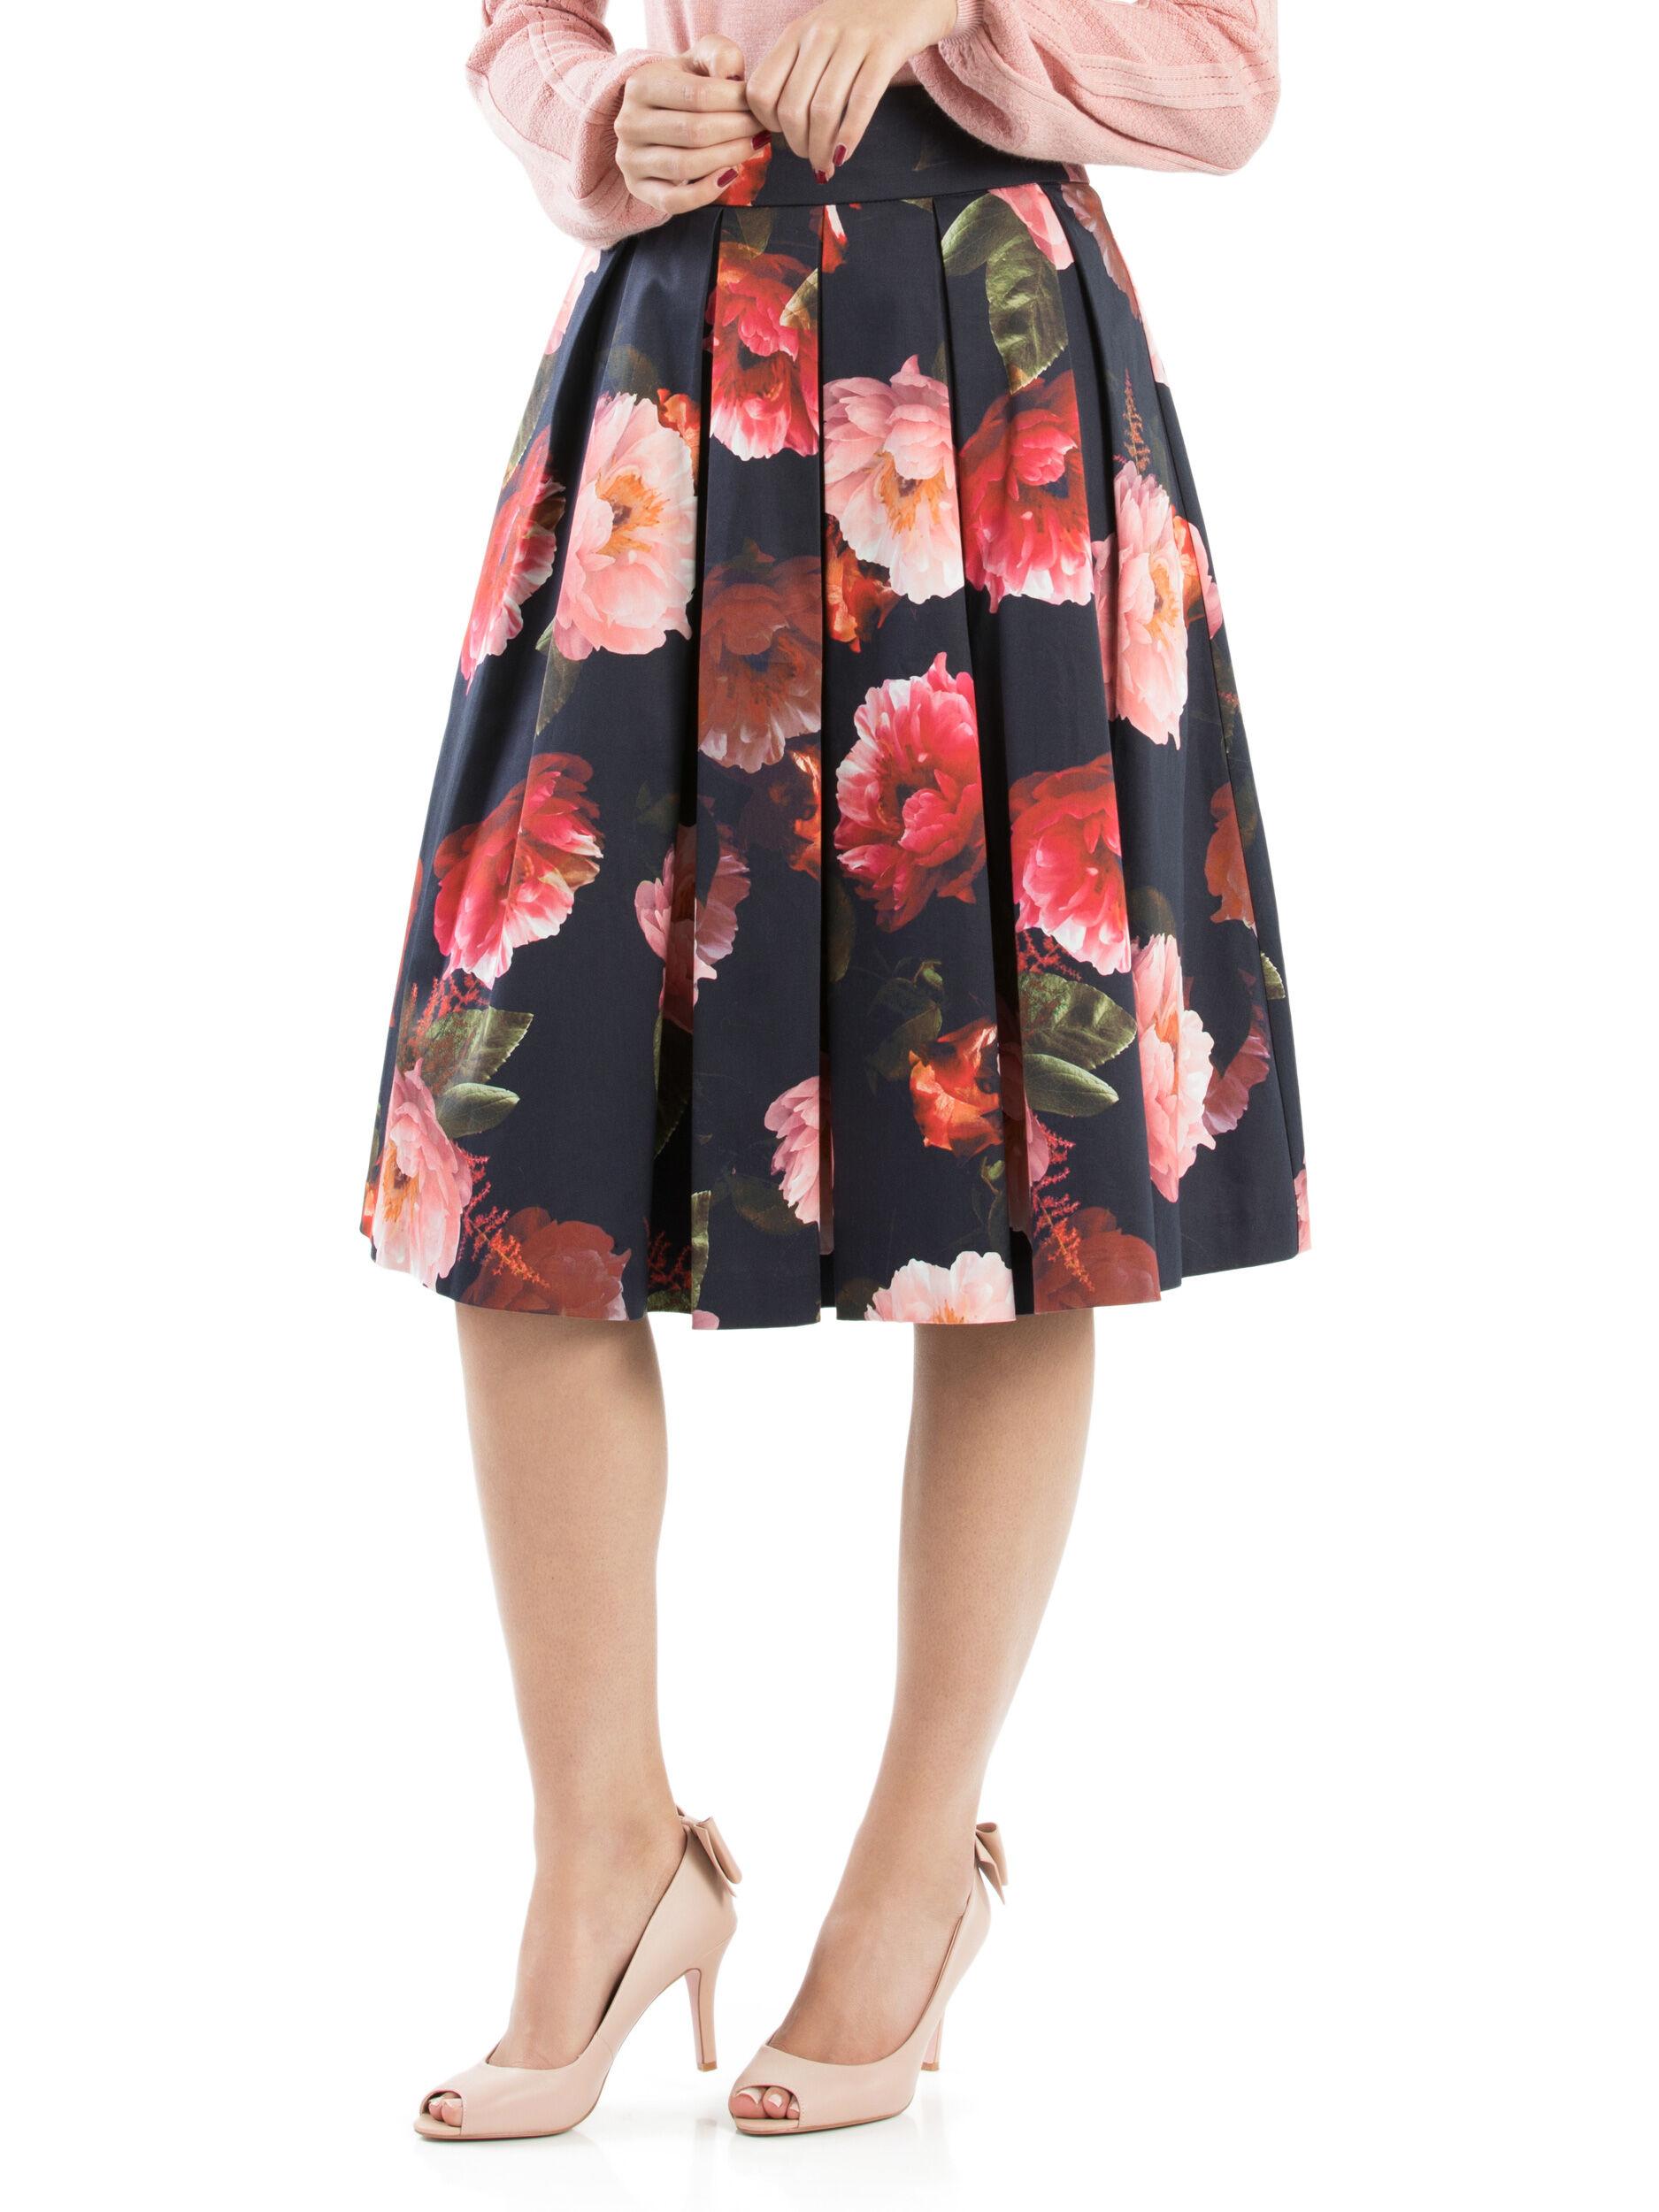 Mystic Floral Skirt